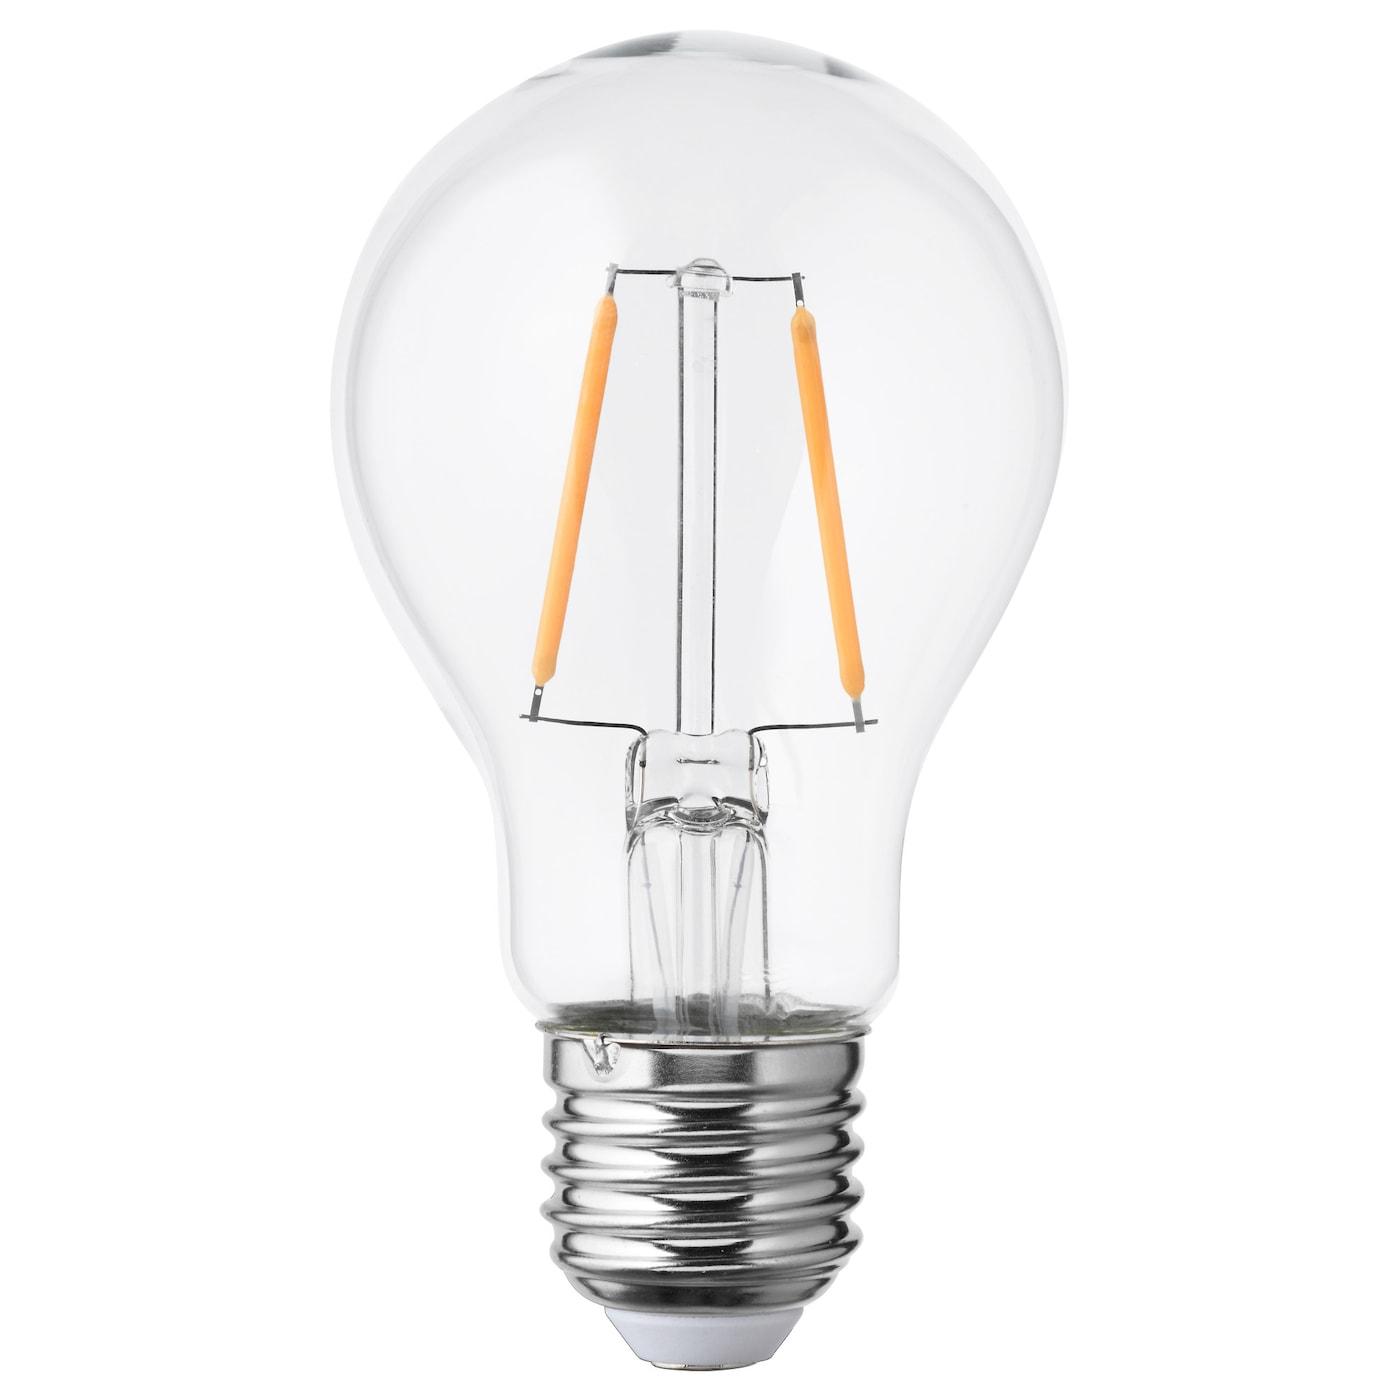 light bulbs shop at ikea ireland. Black Bedroom Furniture Sets. Home Design Ideas